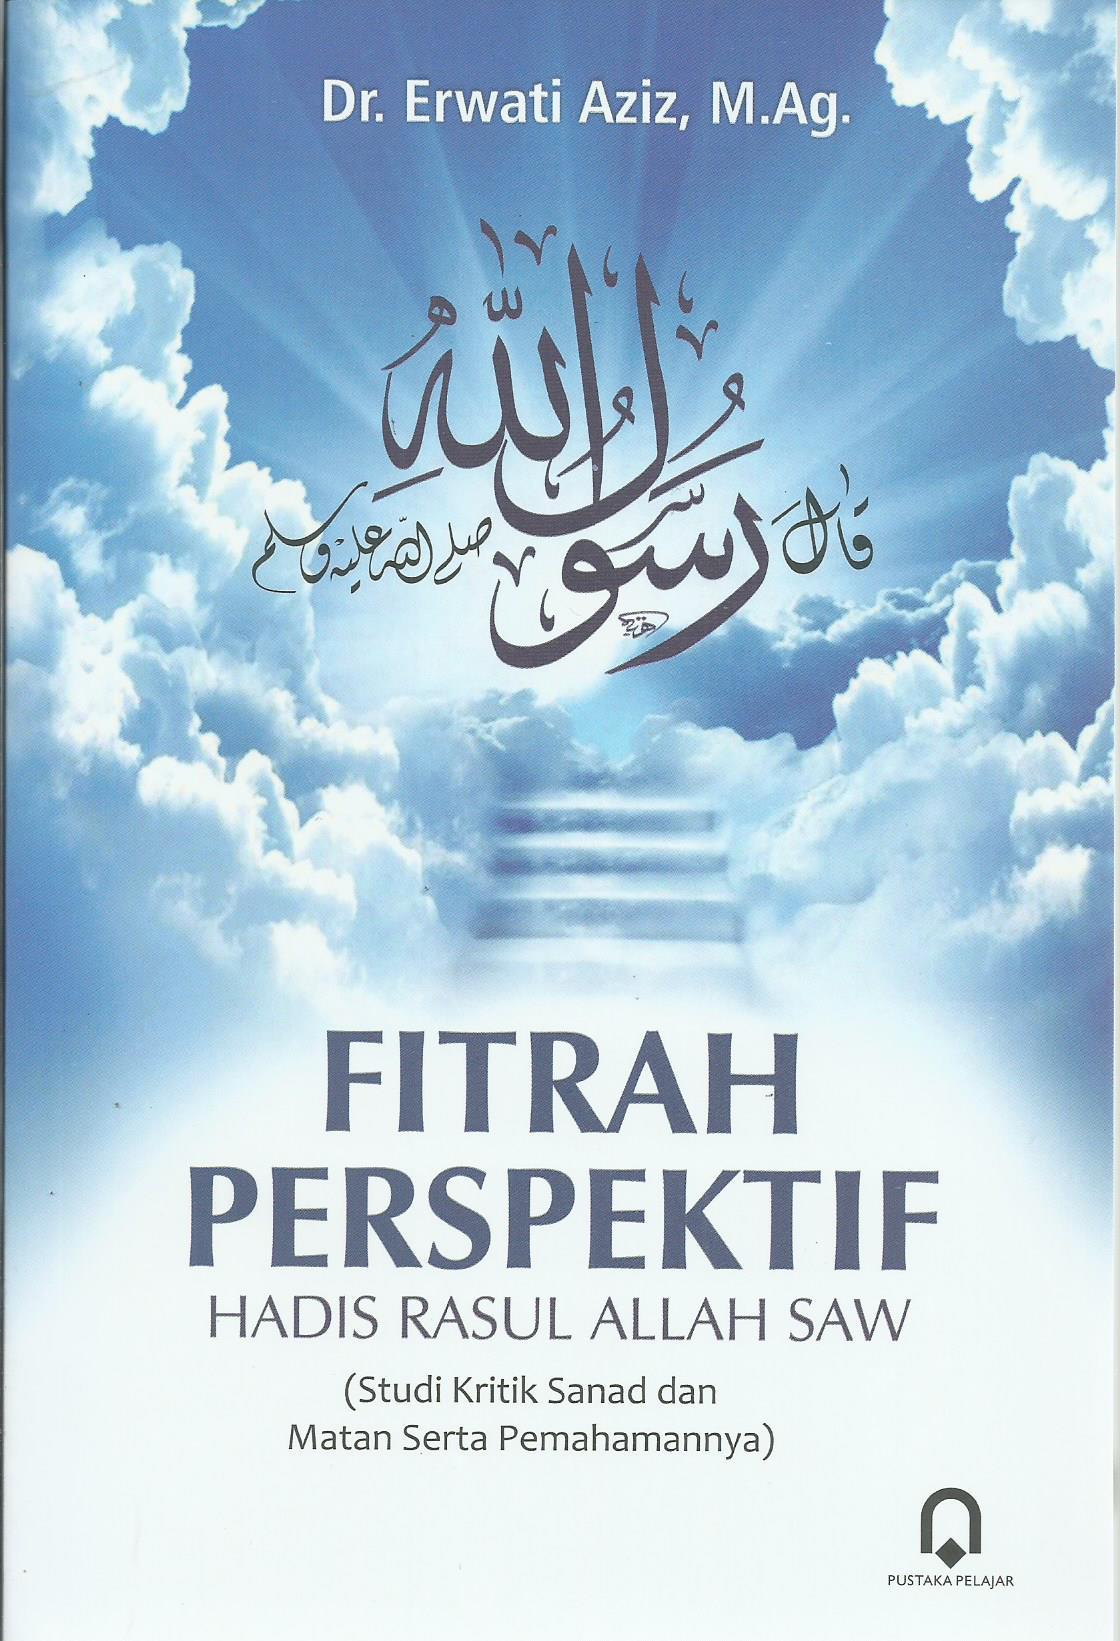 Fitrah Perspektif Hadis Rasul Allah SAW